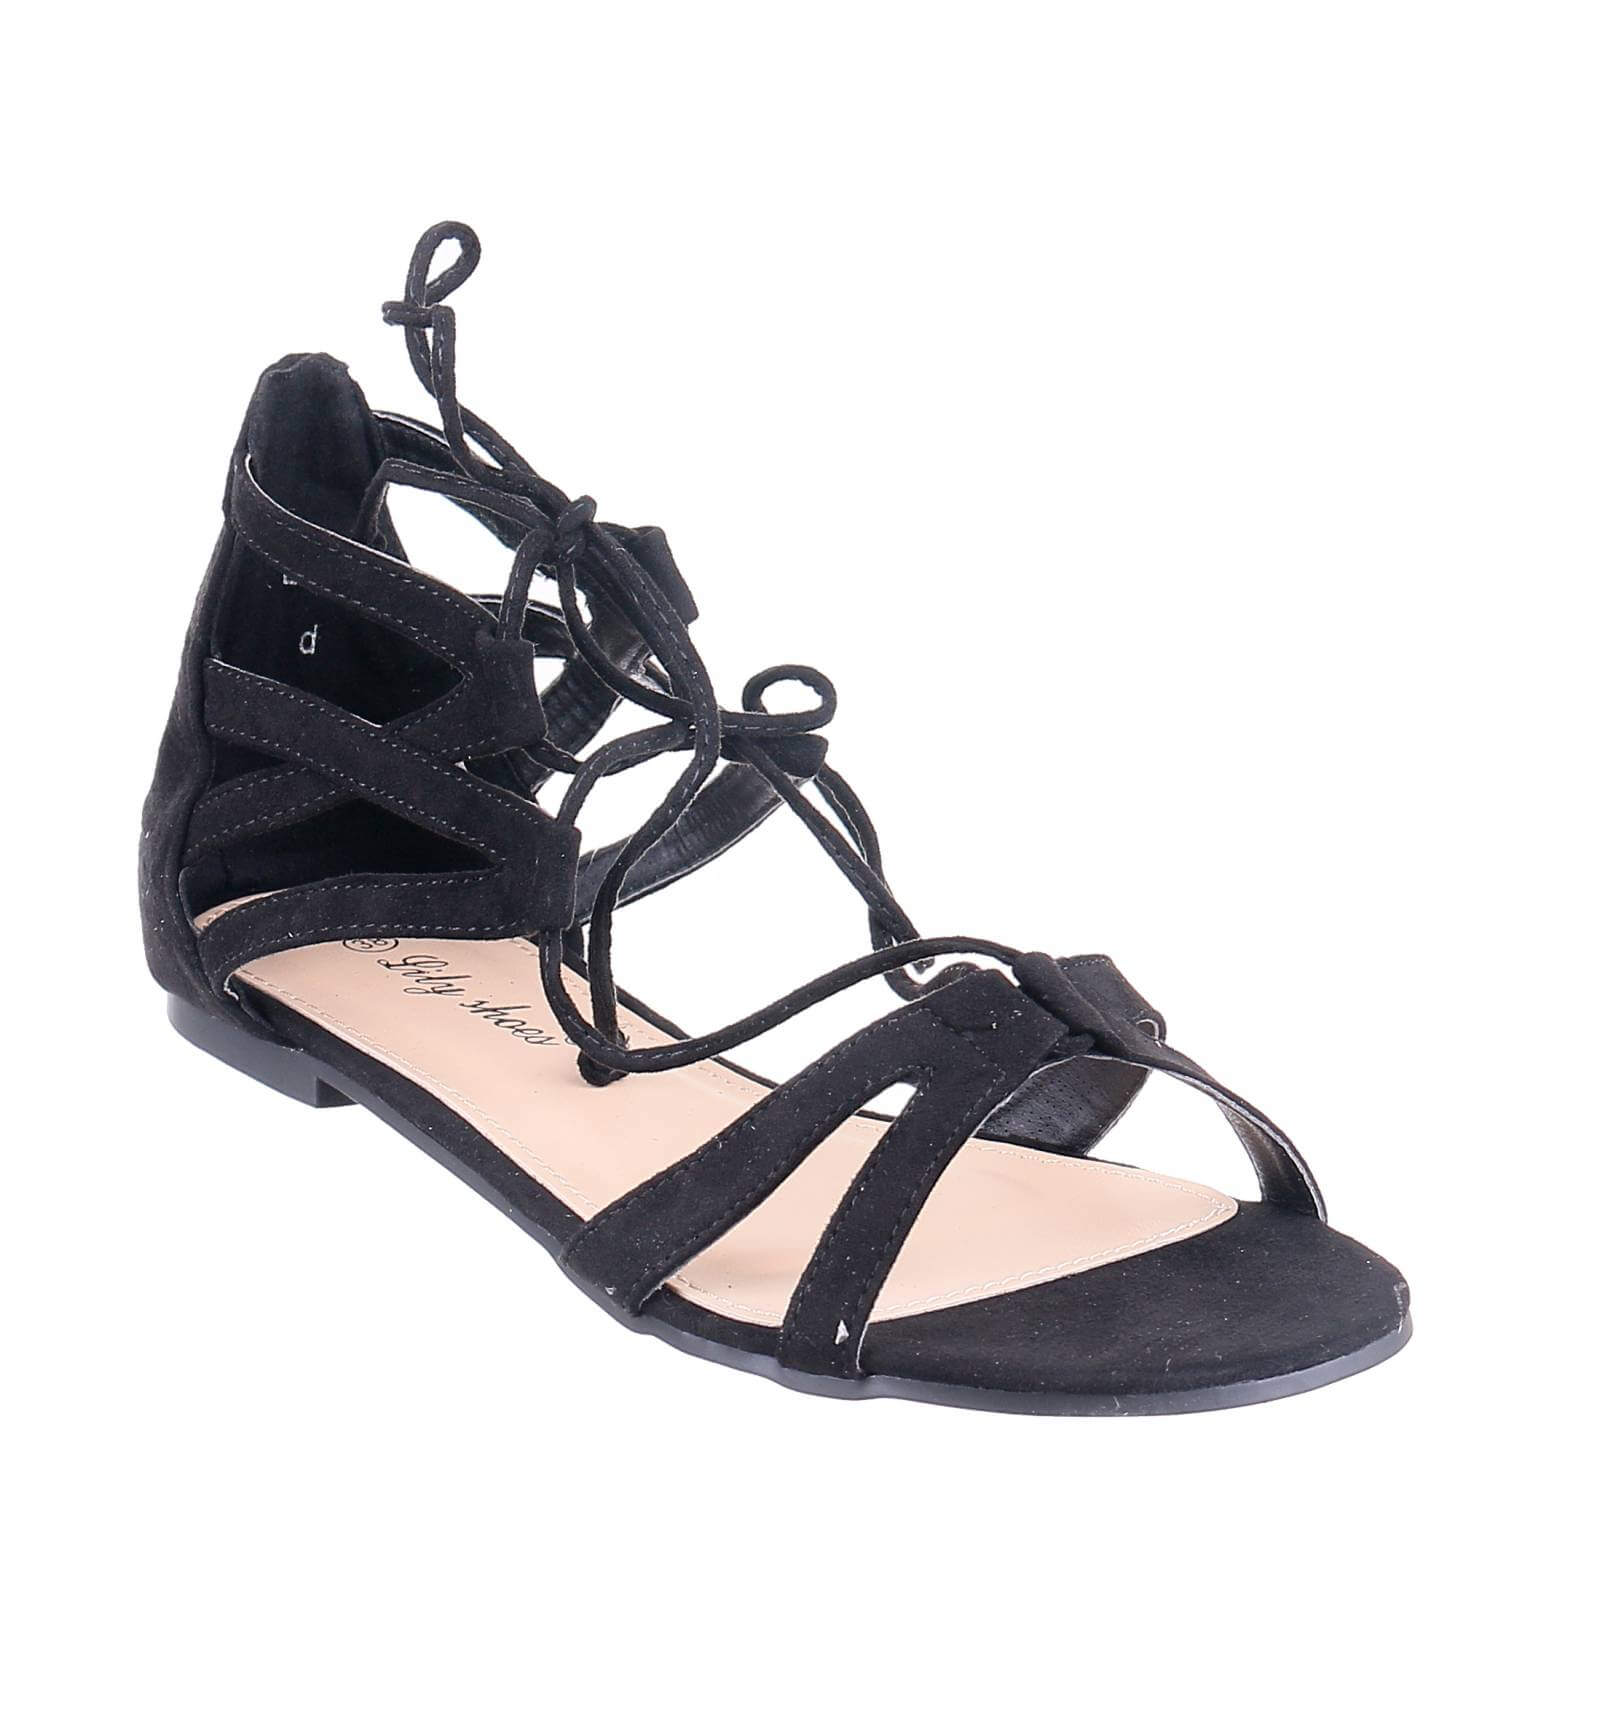 sandale femme plate de grande qualit avec lacets montants lesley. Black Bedroom Furniture Sets. Home Design Ideas